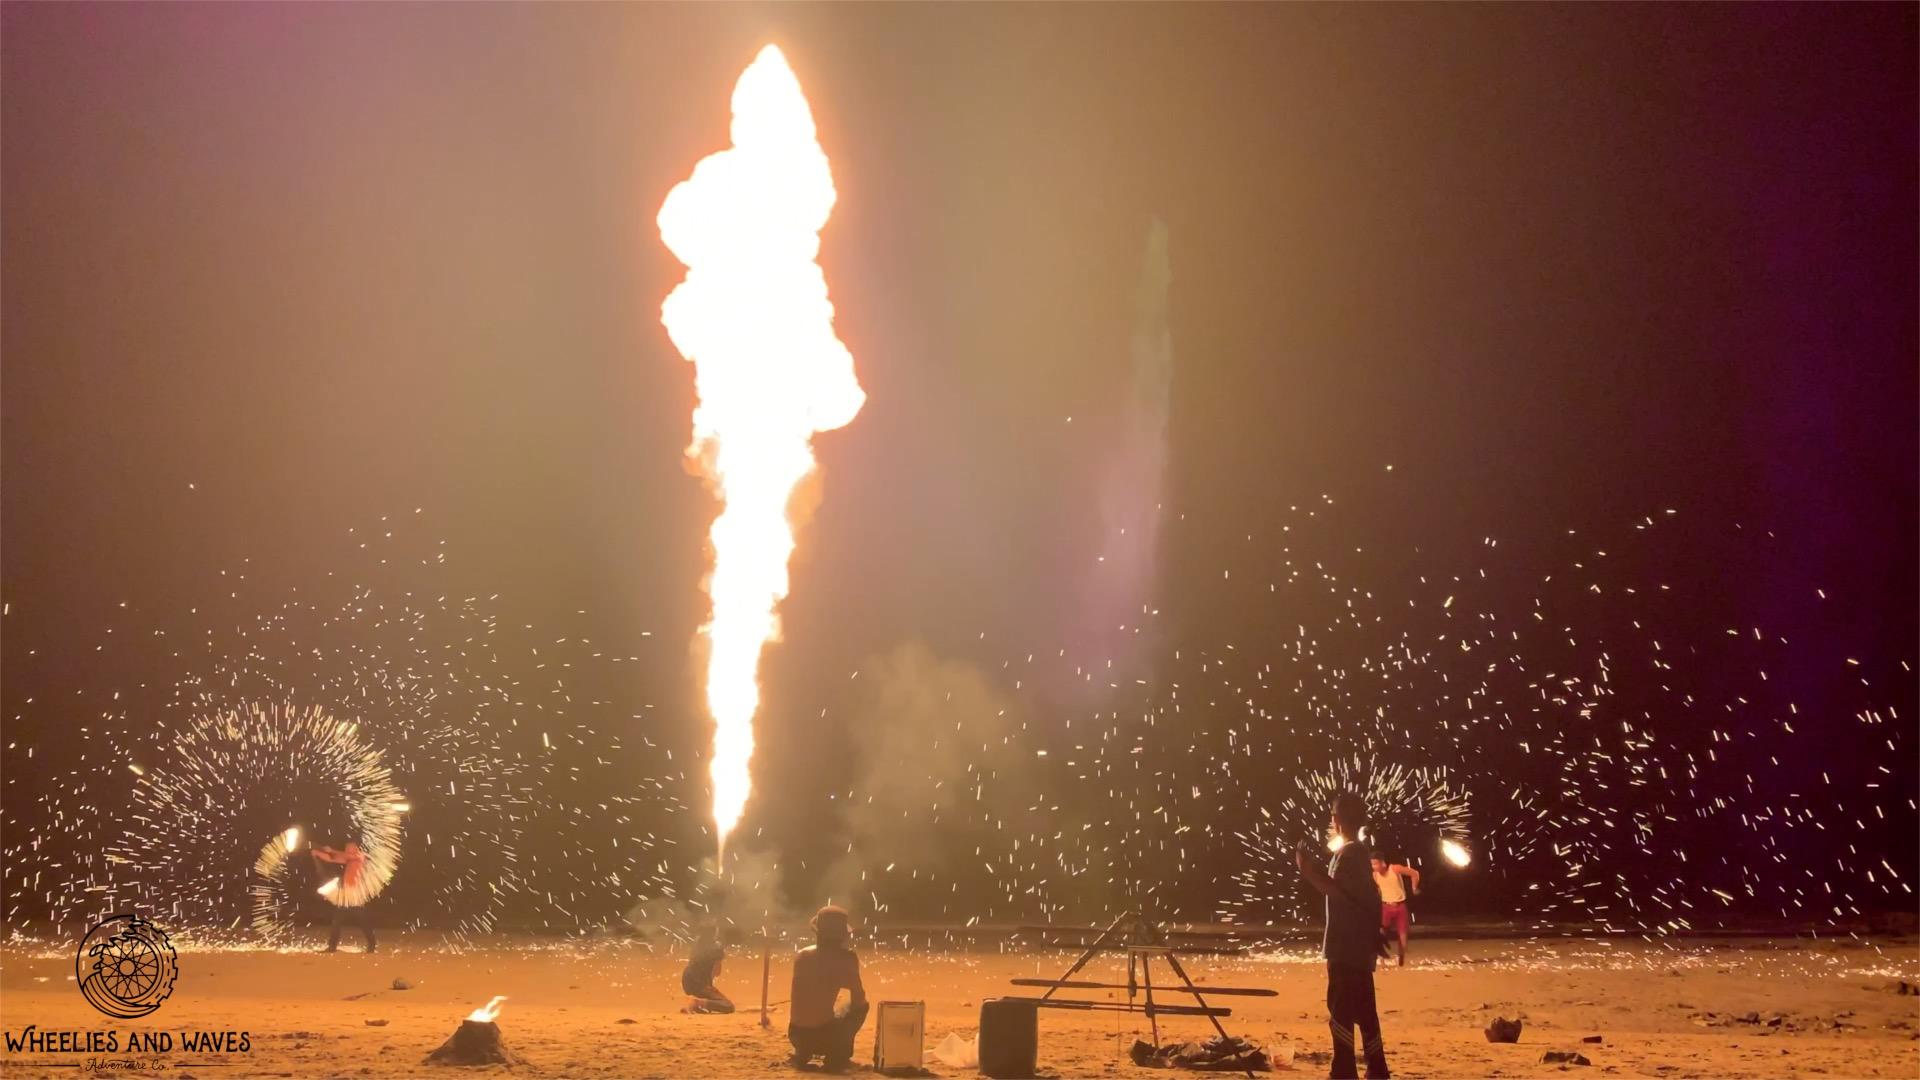 thailand fire show.jpg